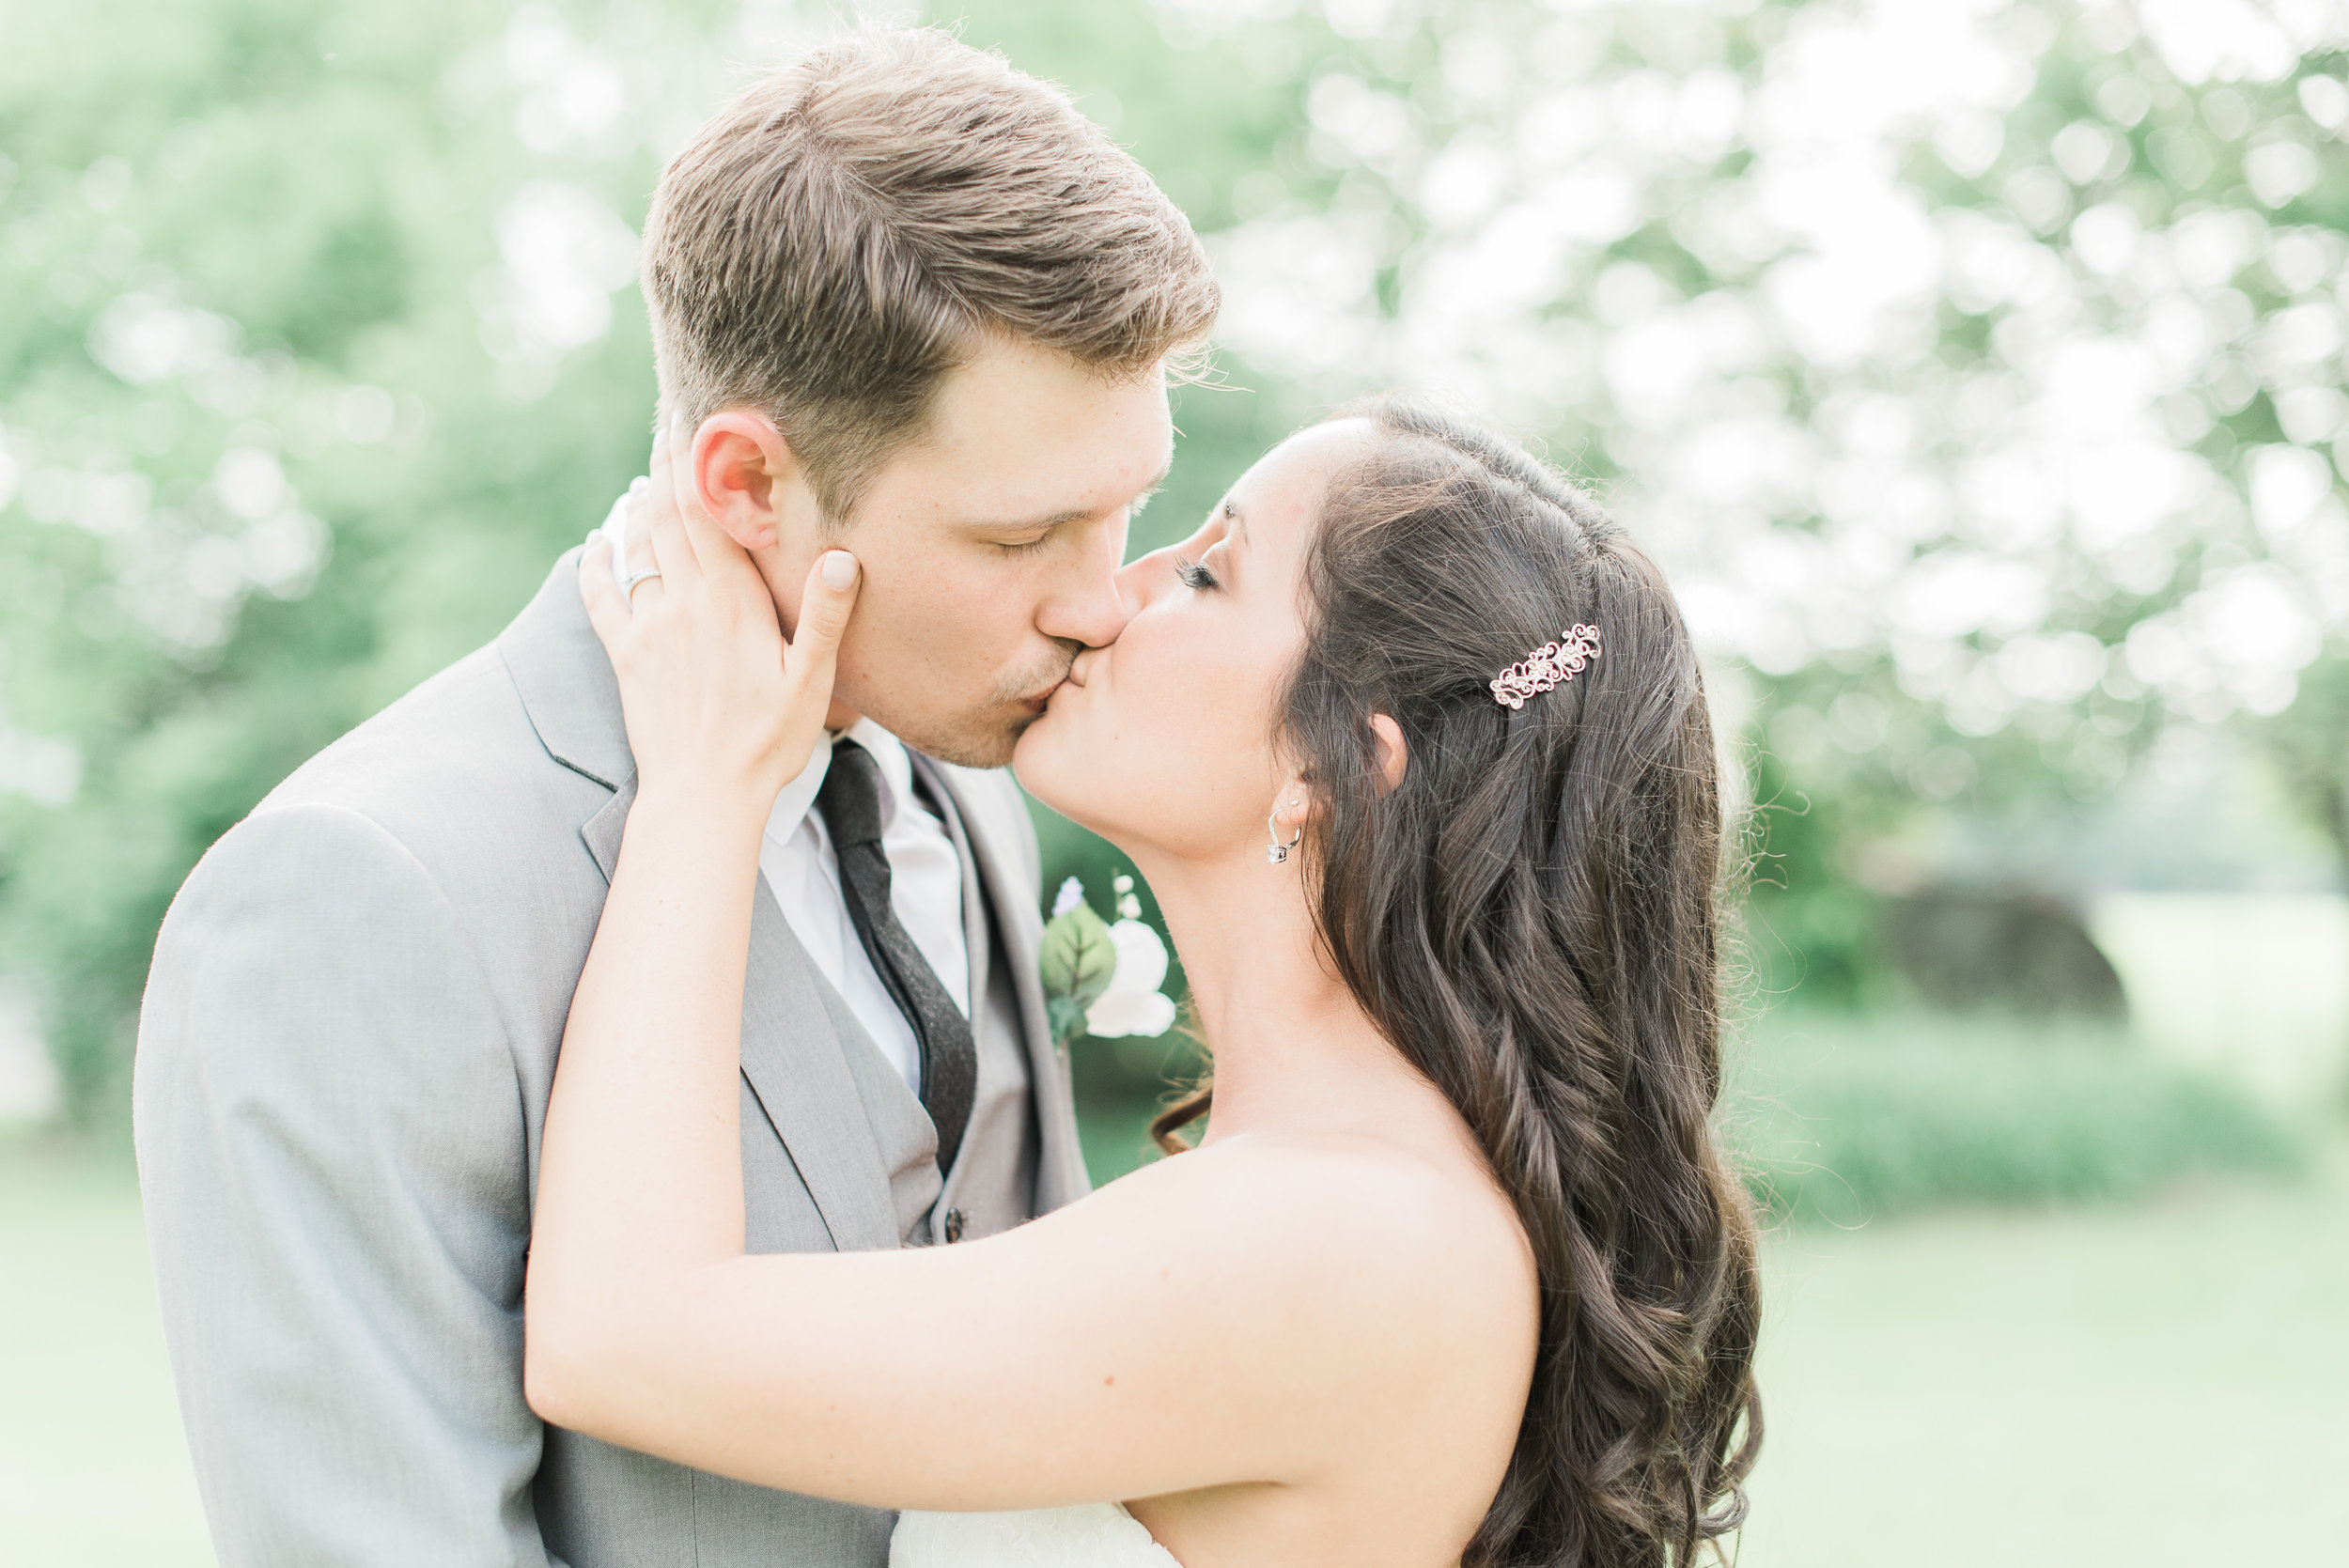 Favorites-2017-05-20 Sarah Marcus Wedding13256-107 copy.jpg